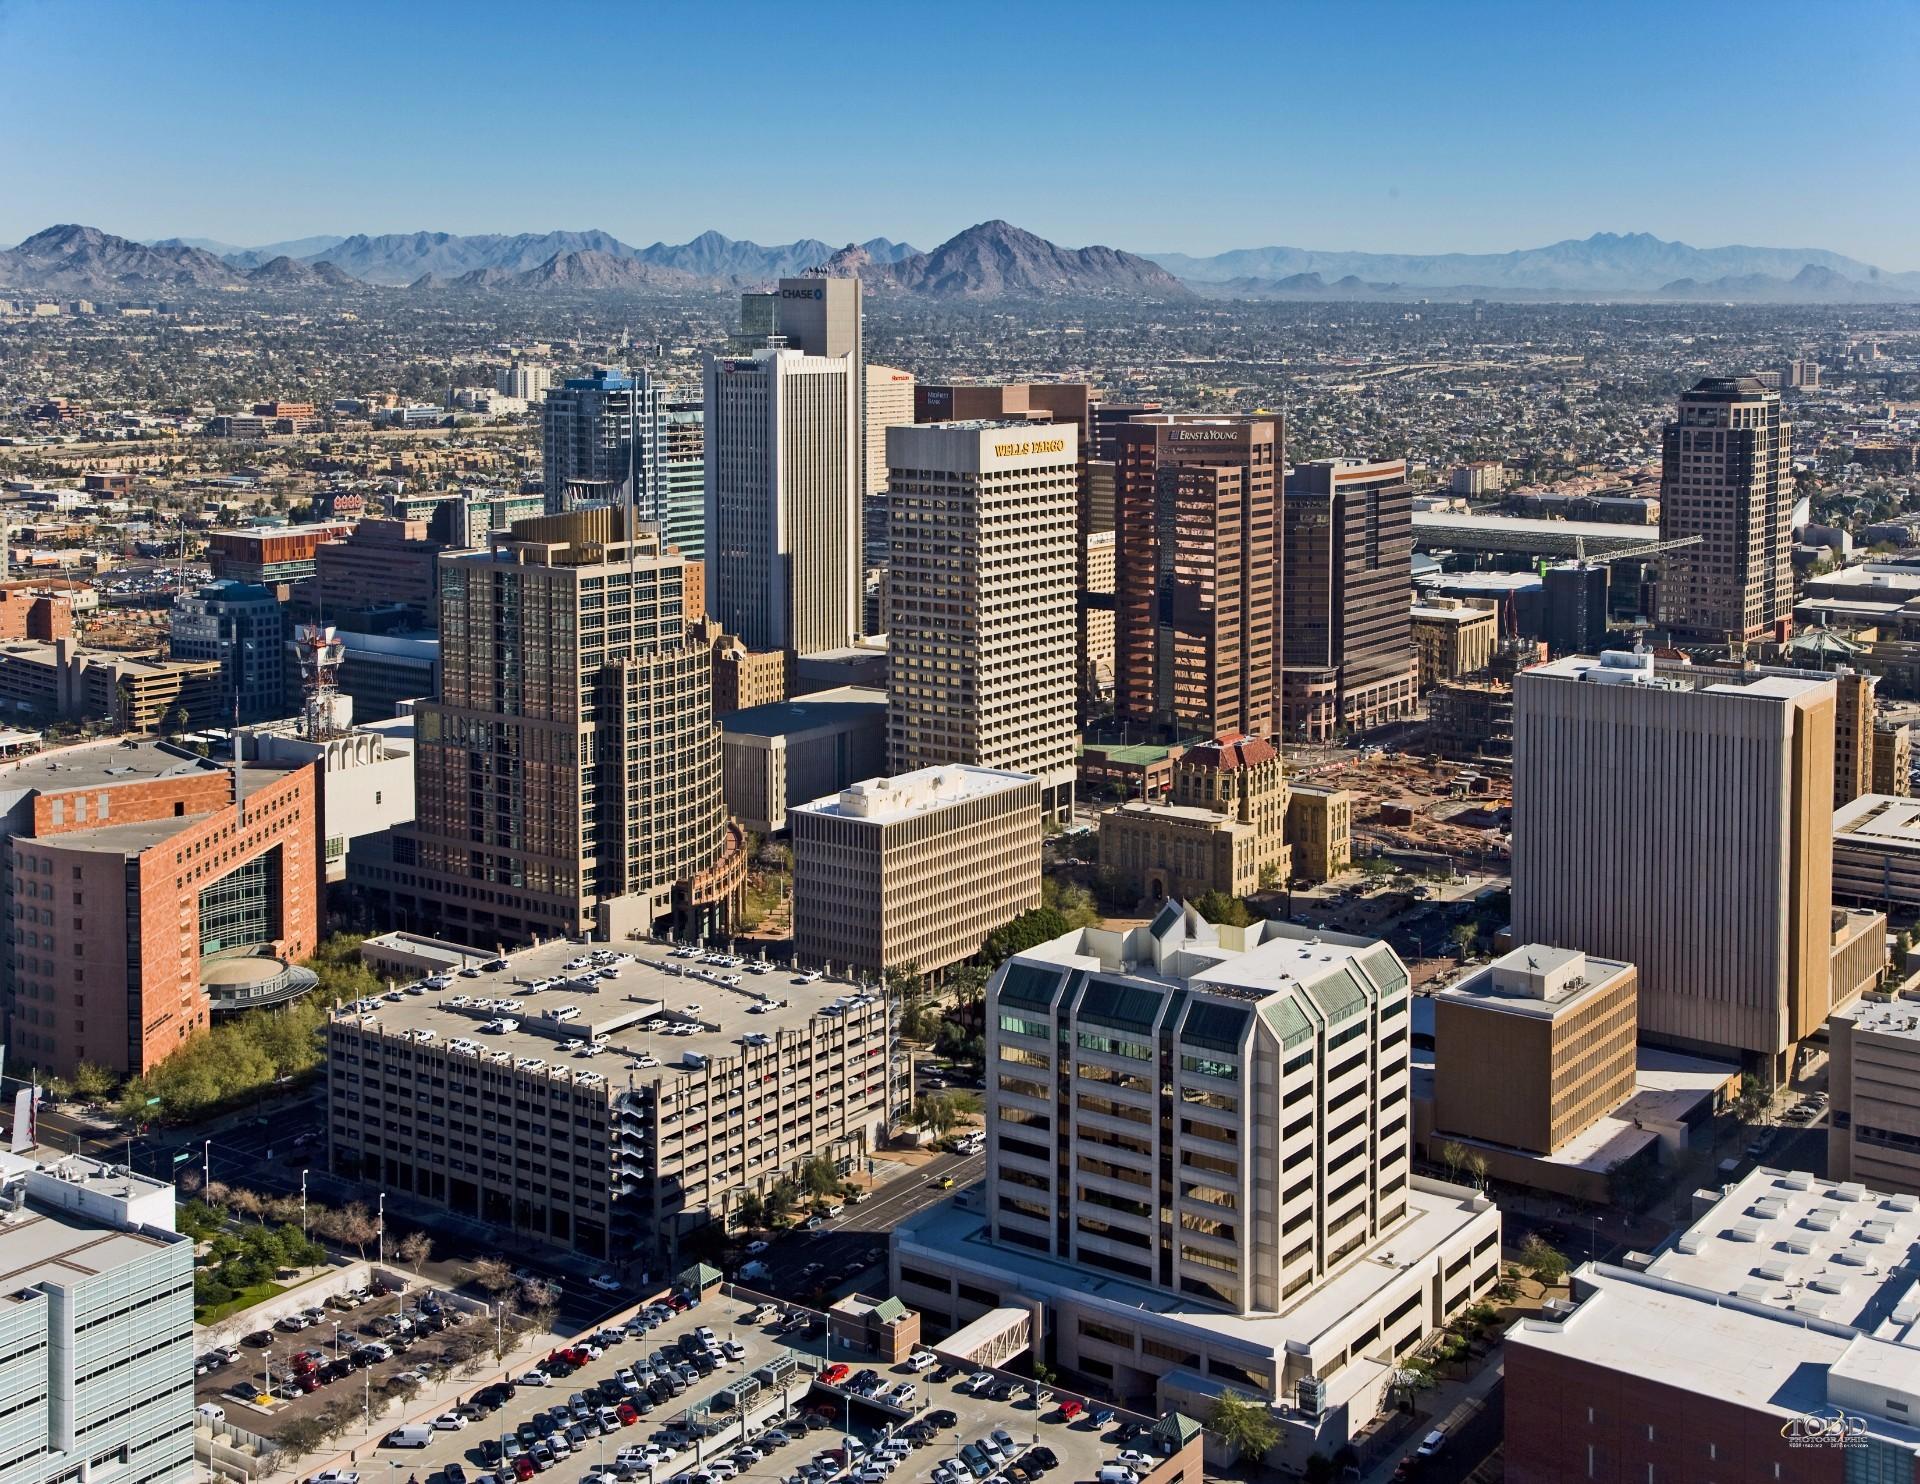 Arizona Population in 2017